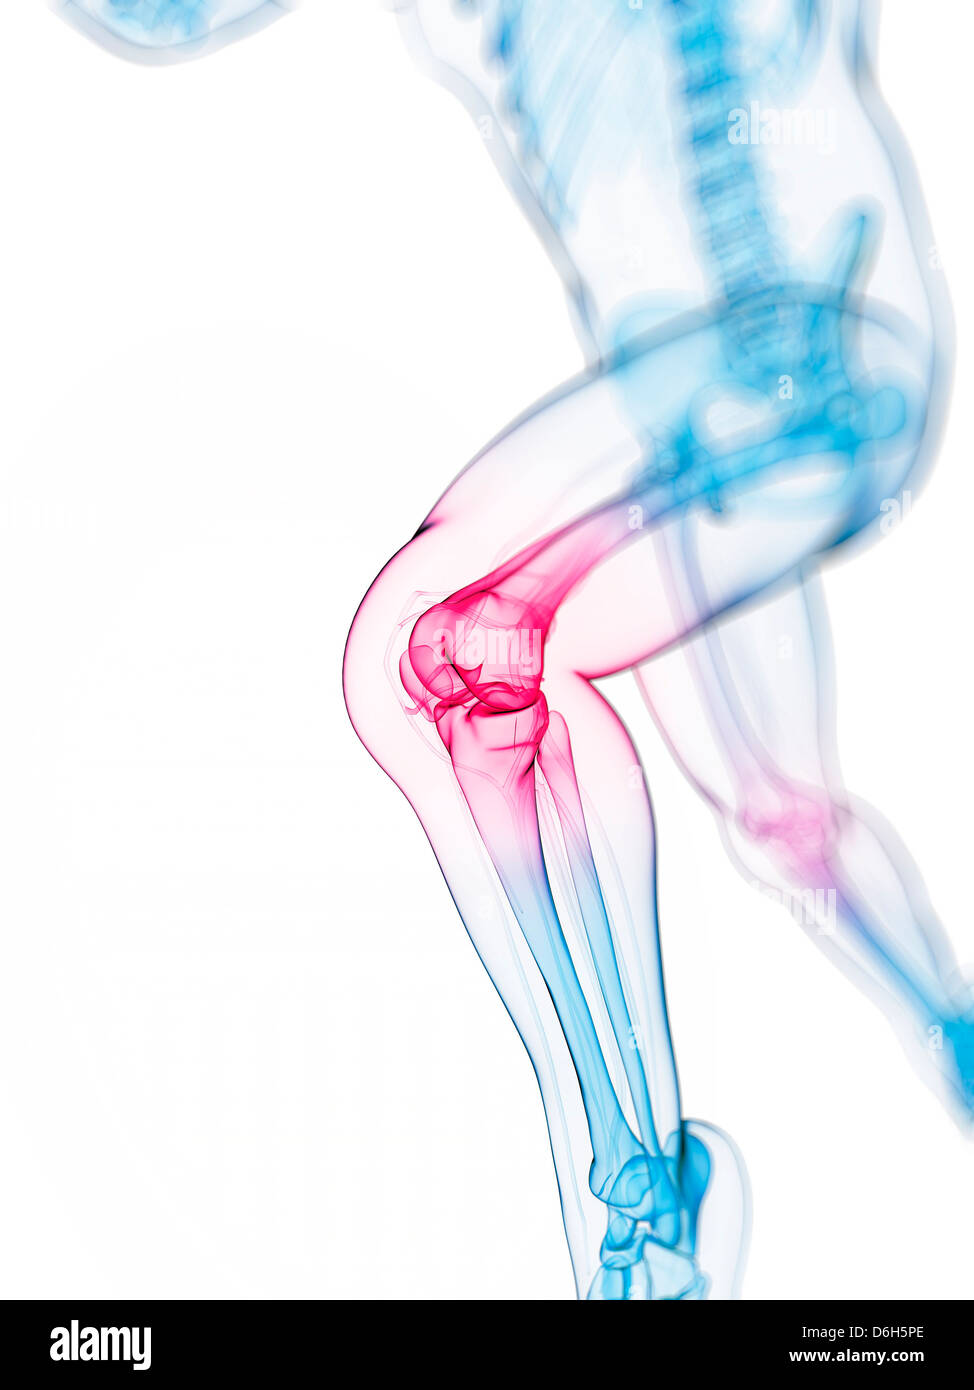 Knee pain, conceptual artwork Stock Photo